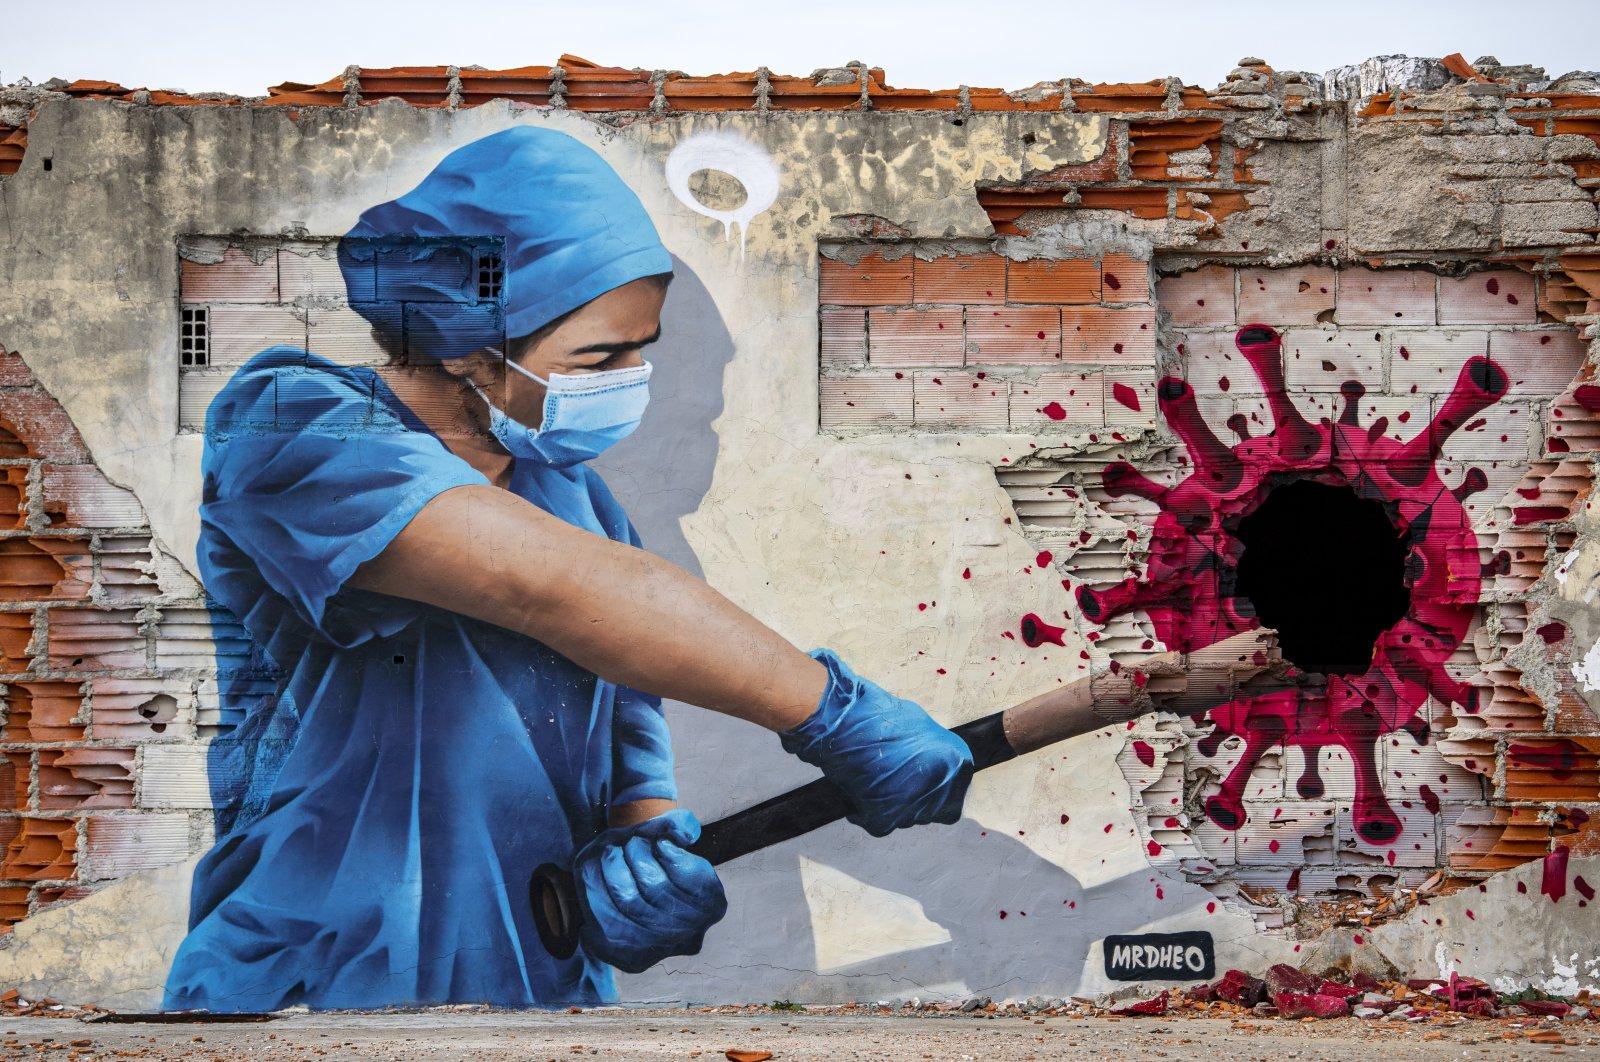 A street art mural depicts a health worker hitting a coronavirus molecule with a baseball bat, in Vila Nova de Gaia, Portugal, Feb. 24, 2021. (Photo by Getty Images)